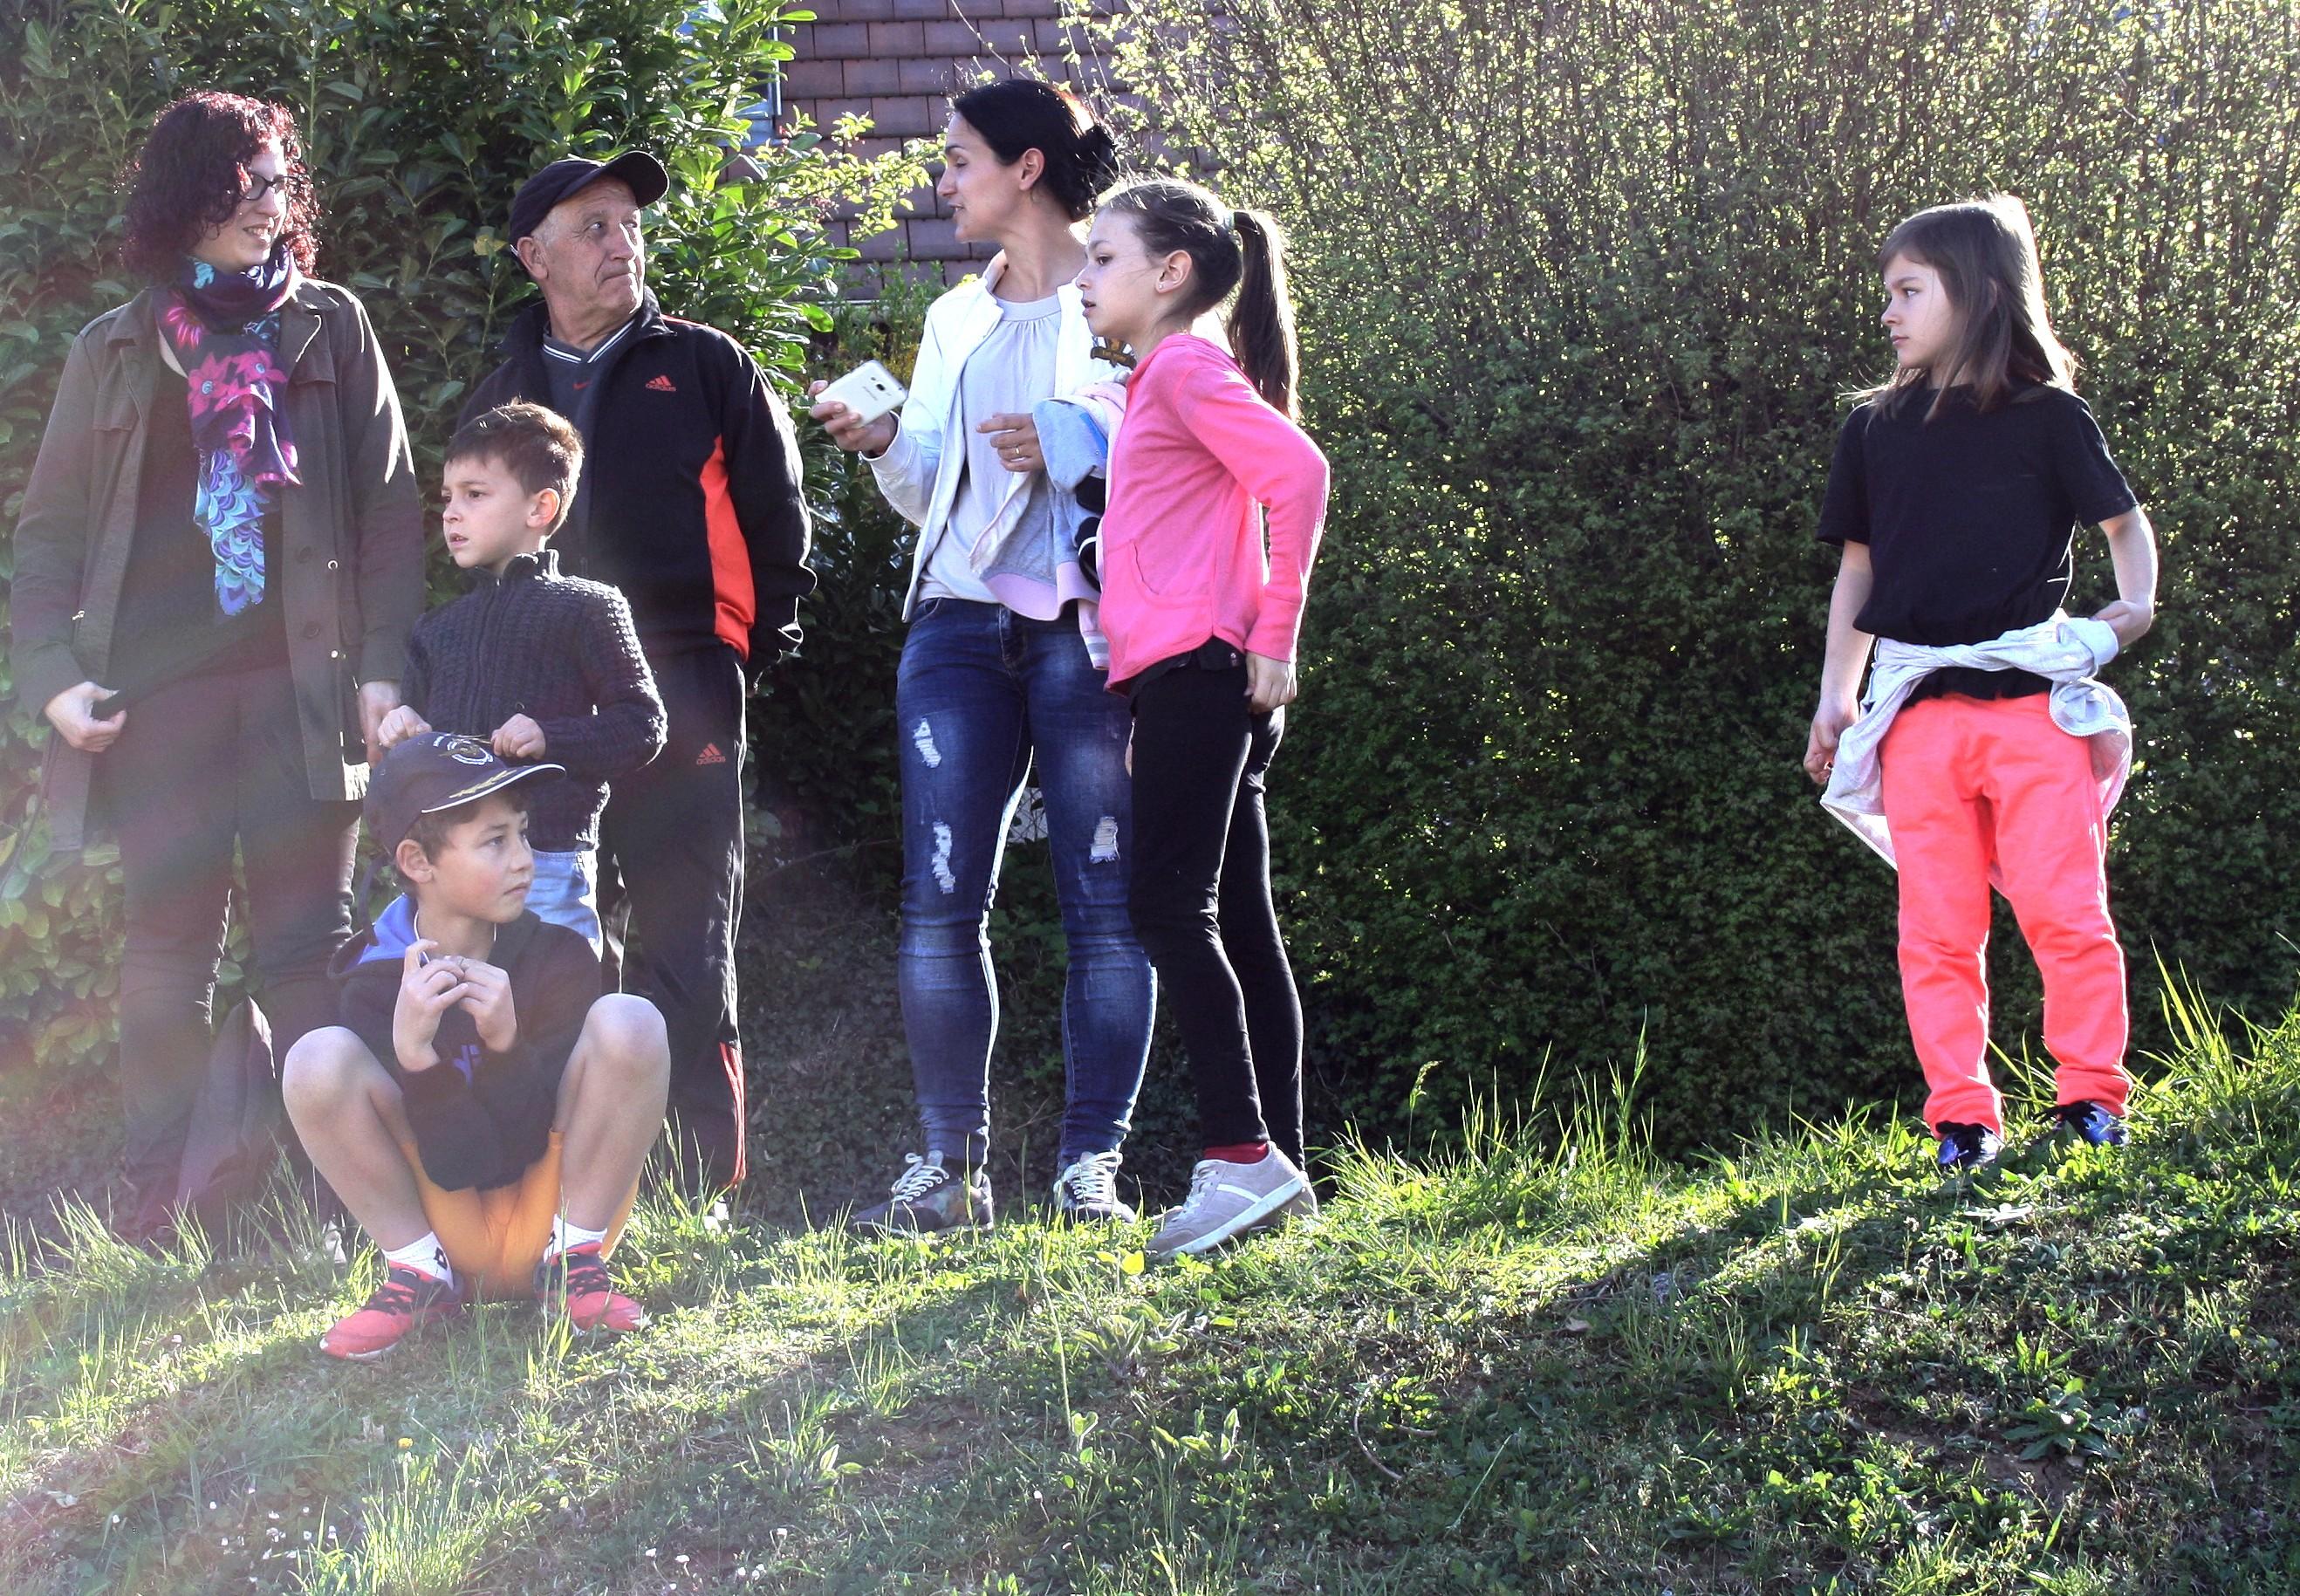 2017-04-09 - Trail-Montfaucon (125)